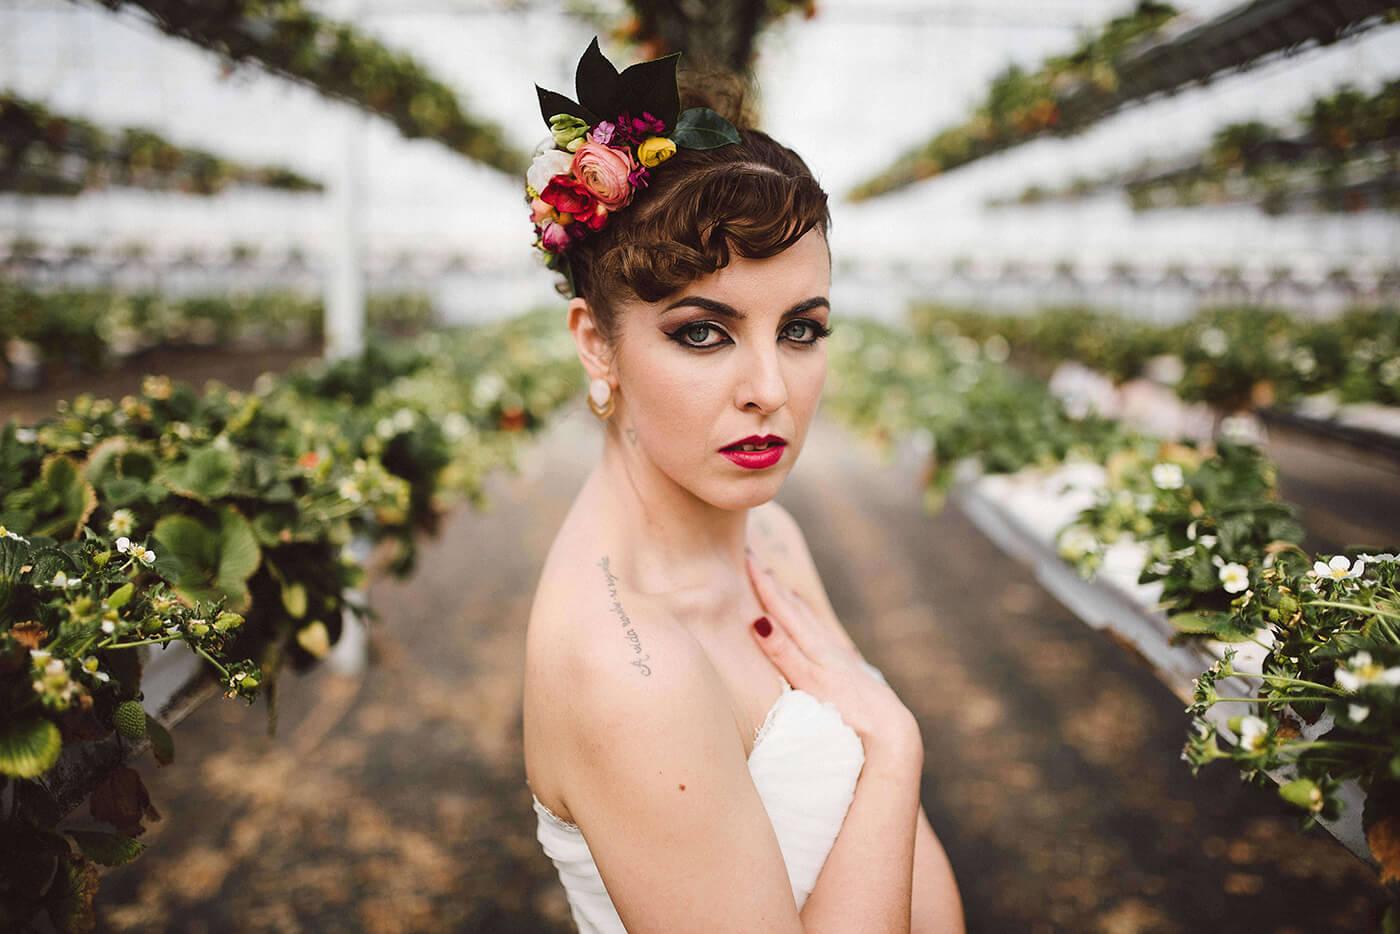 roma-organizacao-eventos-editorial-mid-century-modern-wedding-in-a-strawberry-field-10